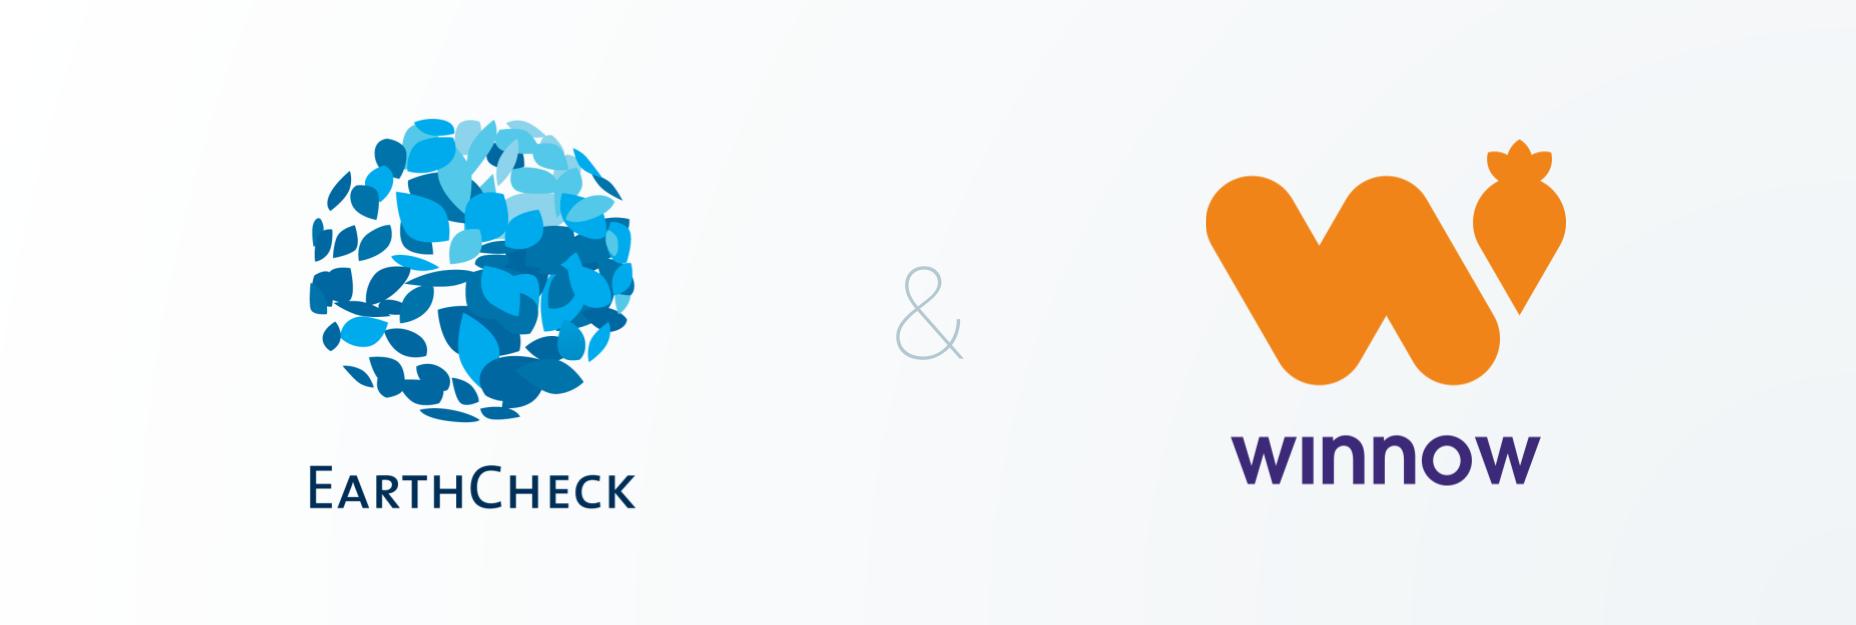 Winnow Blog Template (partnership)-1